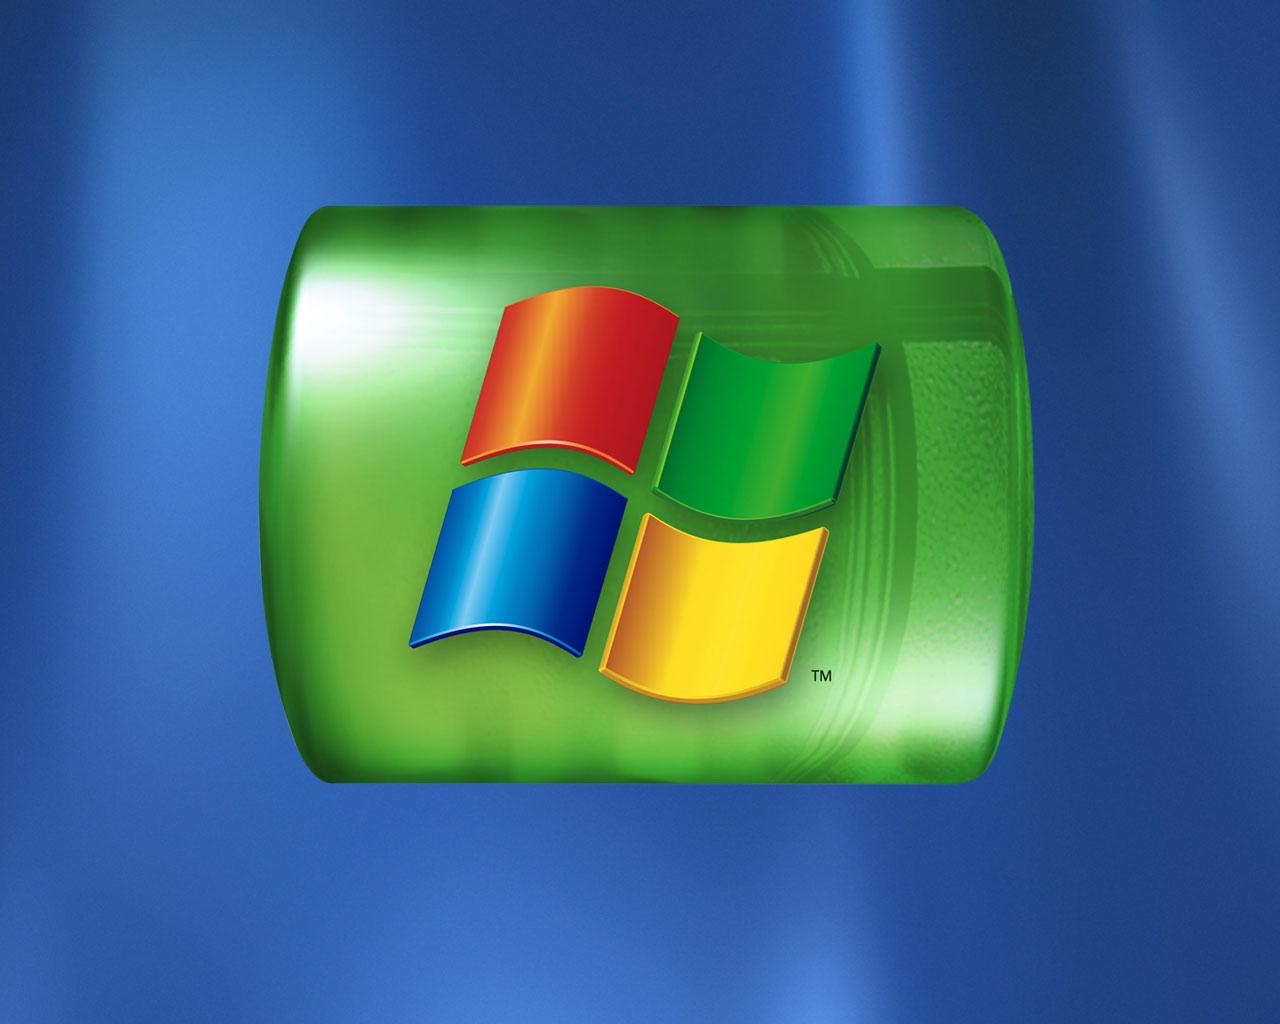 Windows xp media center edition 2005 sp3 desktop by, windows xp.